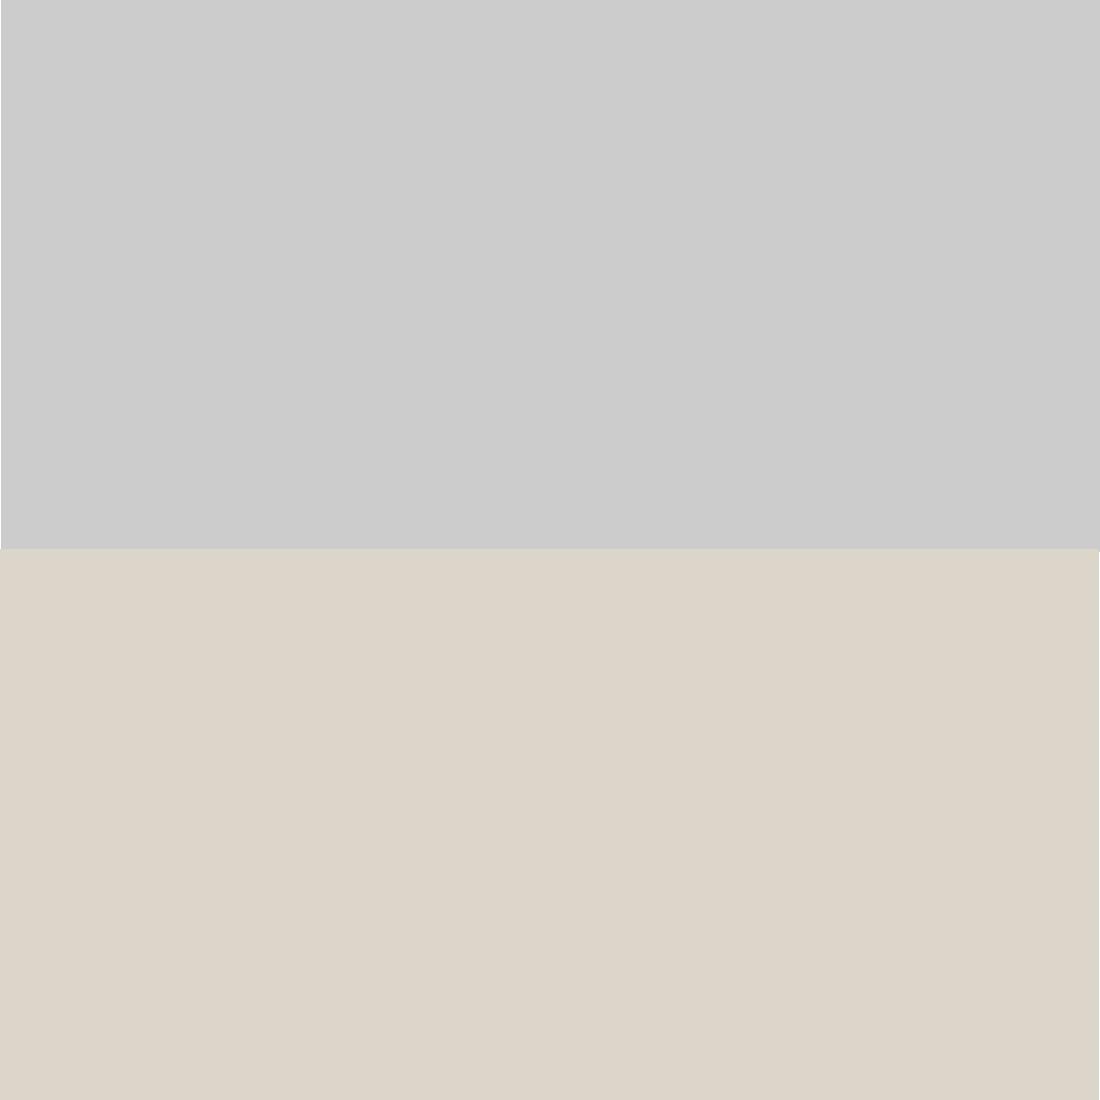 Splash Silver/Sand 4 x 2100 x 750mm